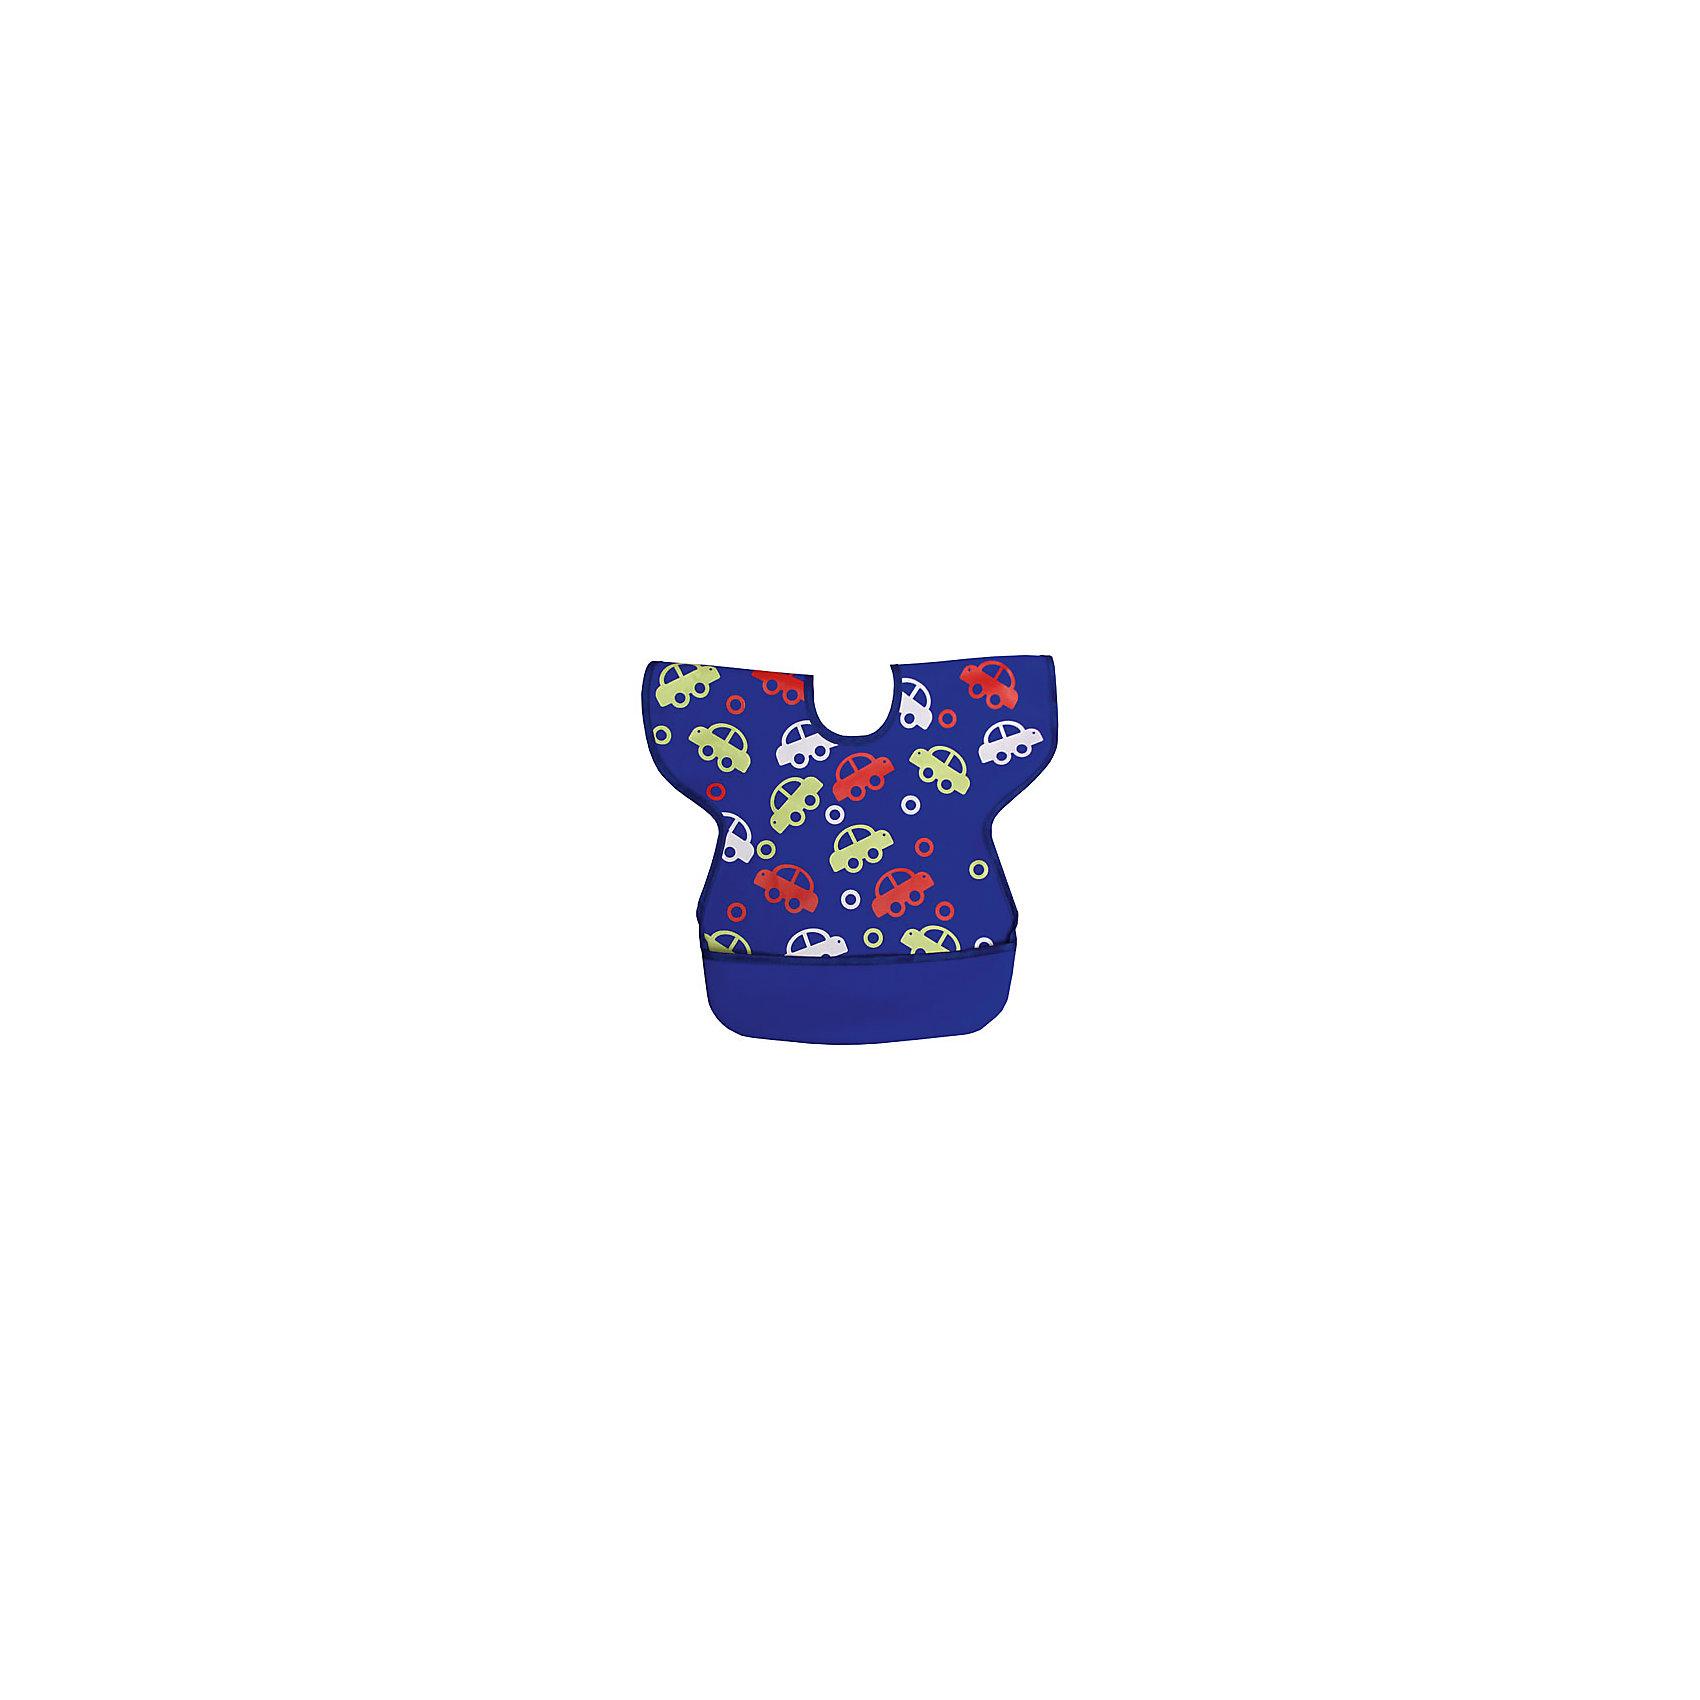 Нагрудник полиуретан с крылышками М, Sevi baby, синий 12-7 sevi baby (Sevi Baby)